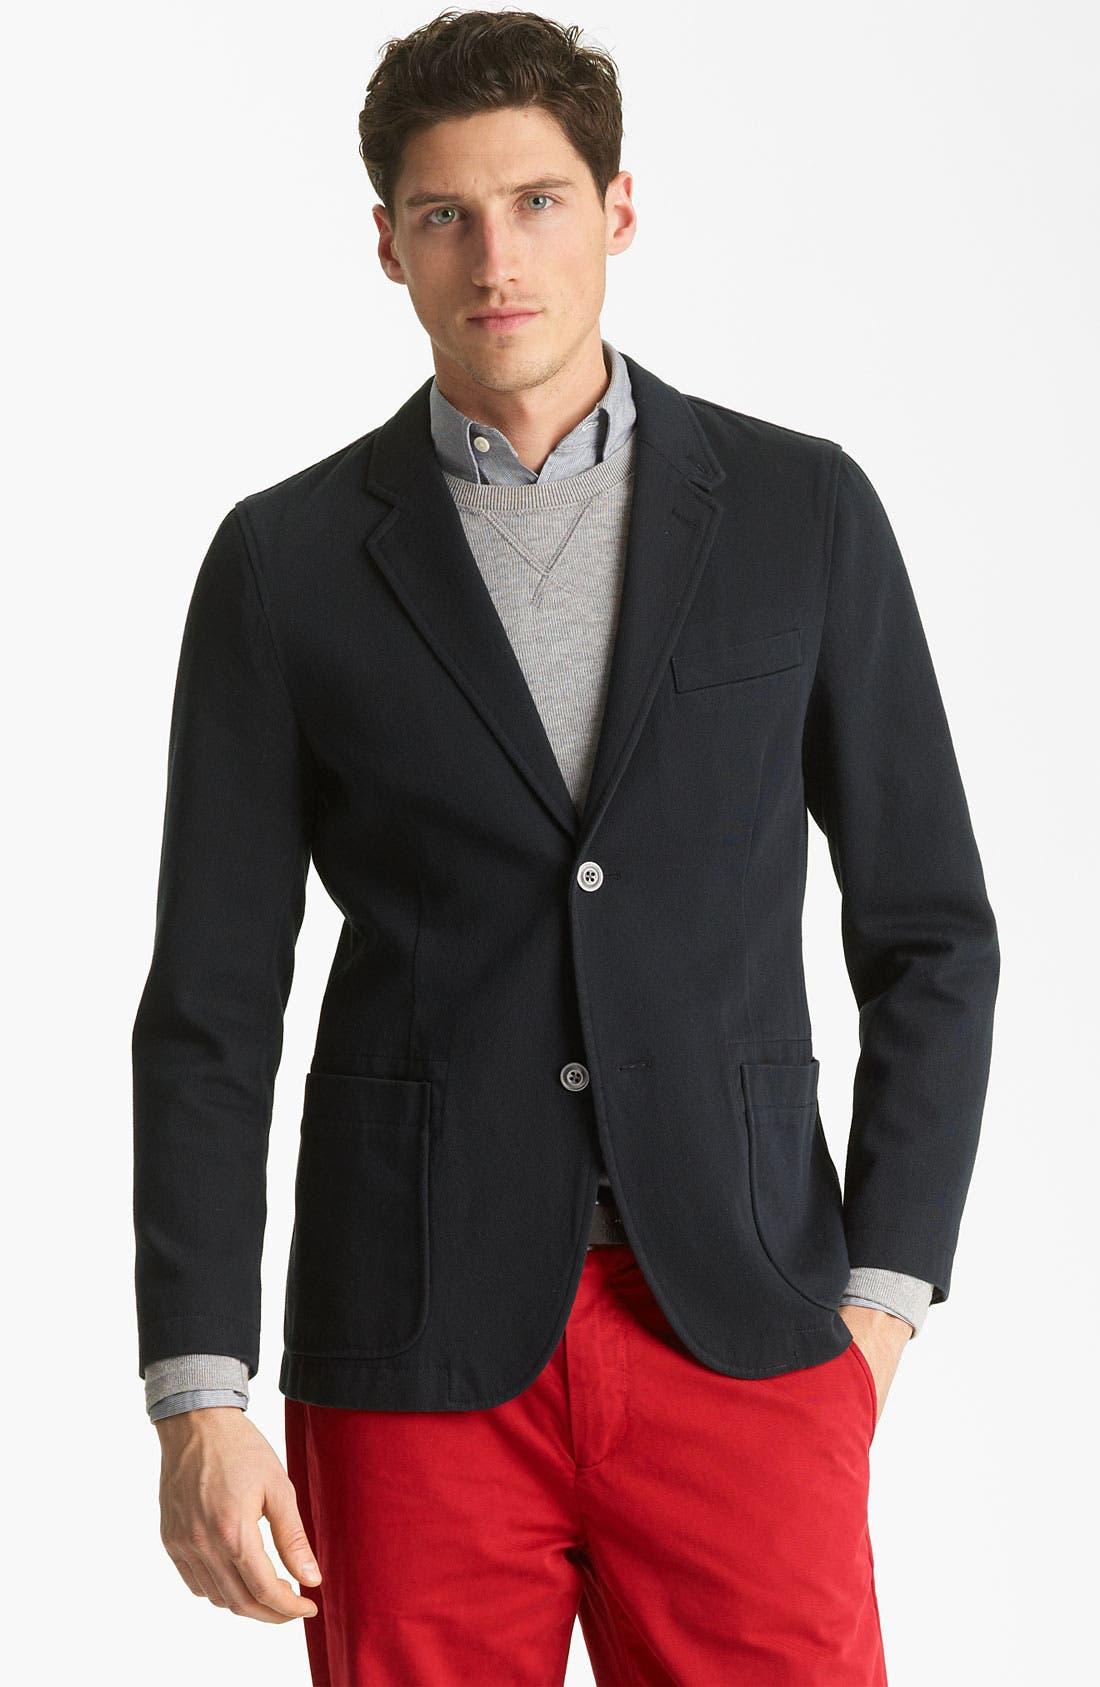 Main Image - Jack Spade 'Sanborn' Twill Cotton Blazer